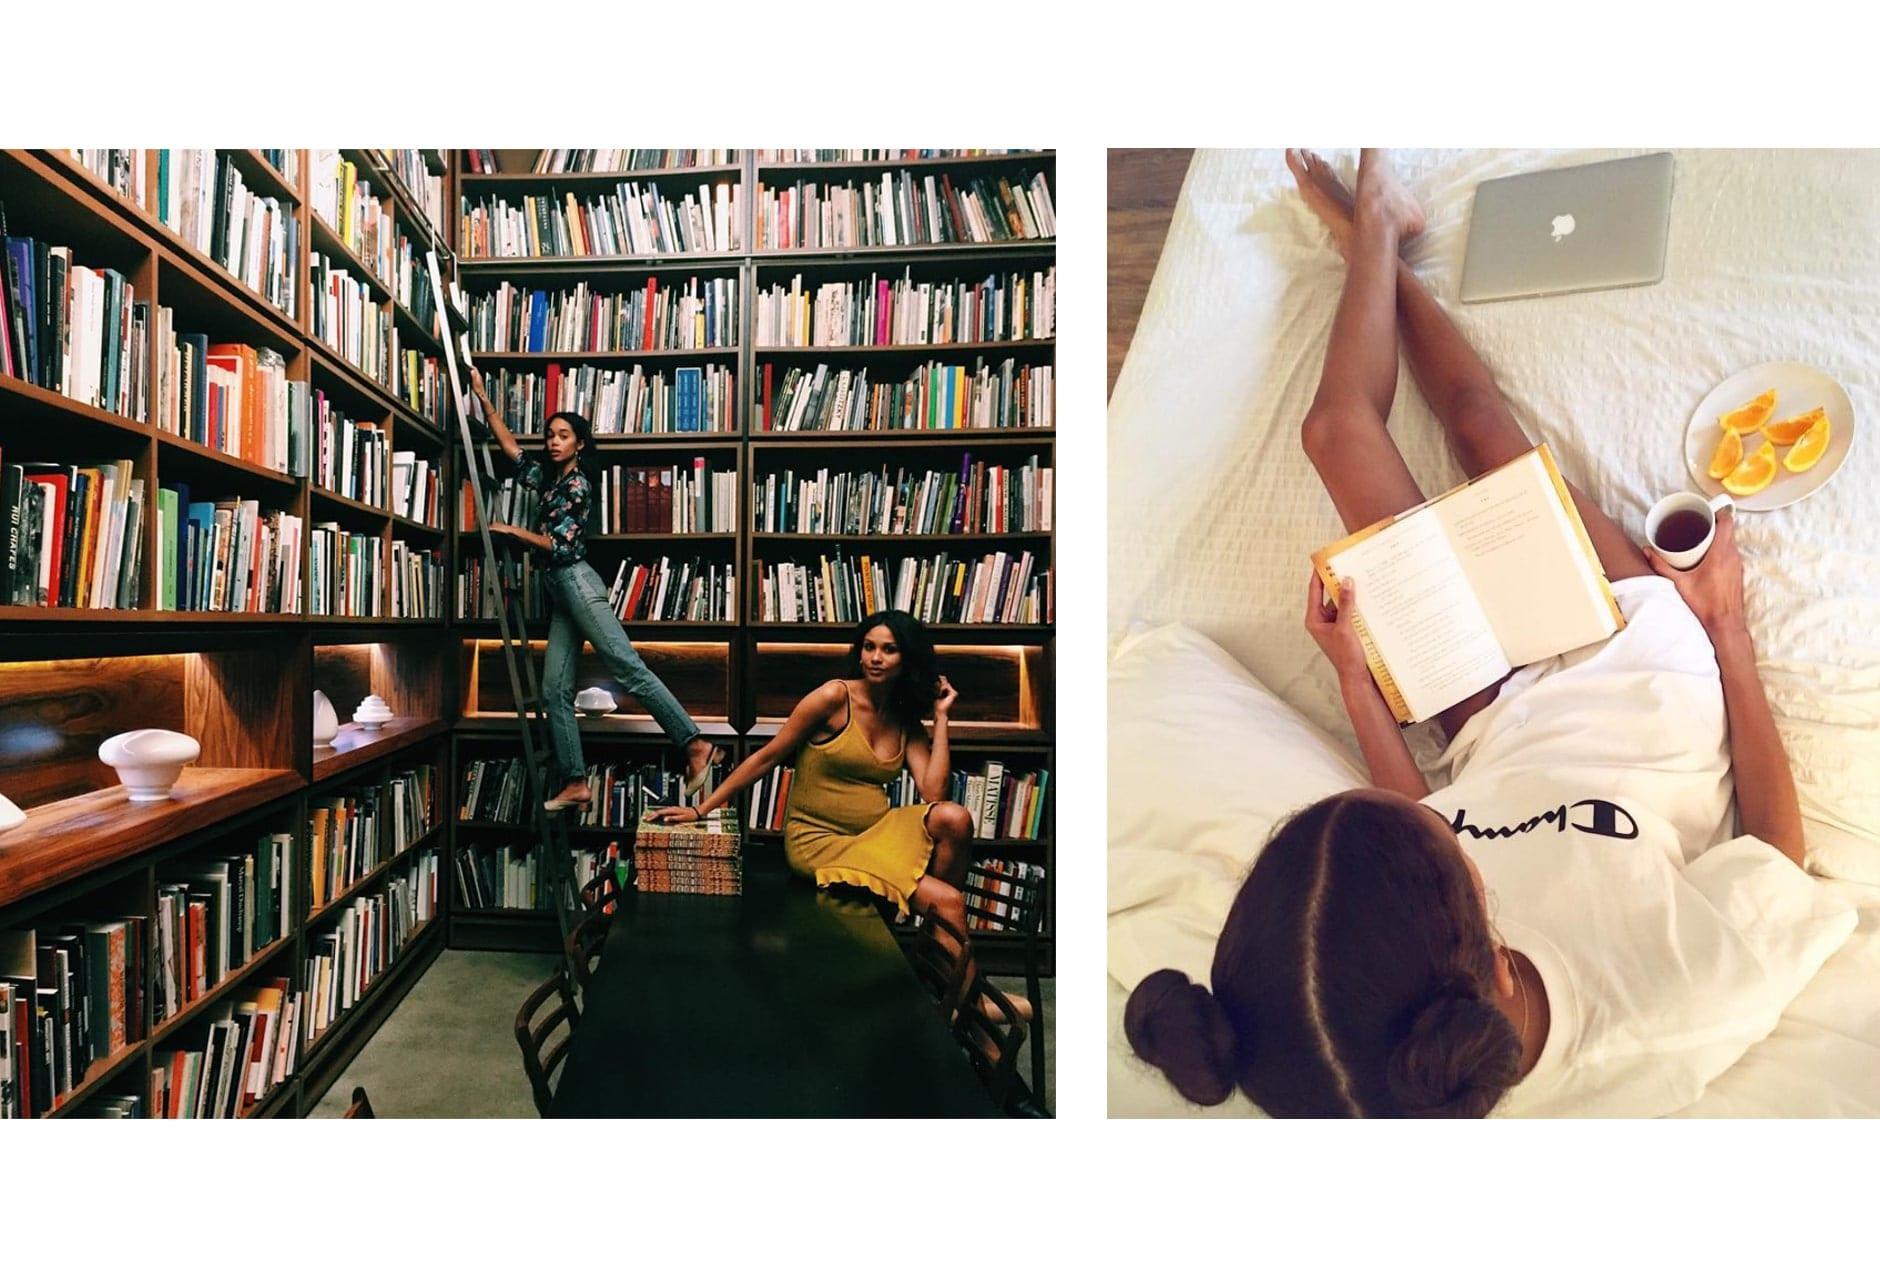 BOOK_lauraharrier_cindybruna-min